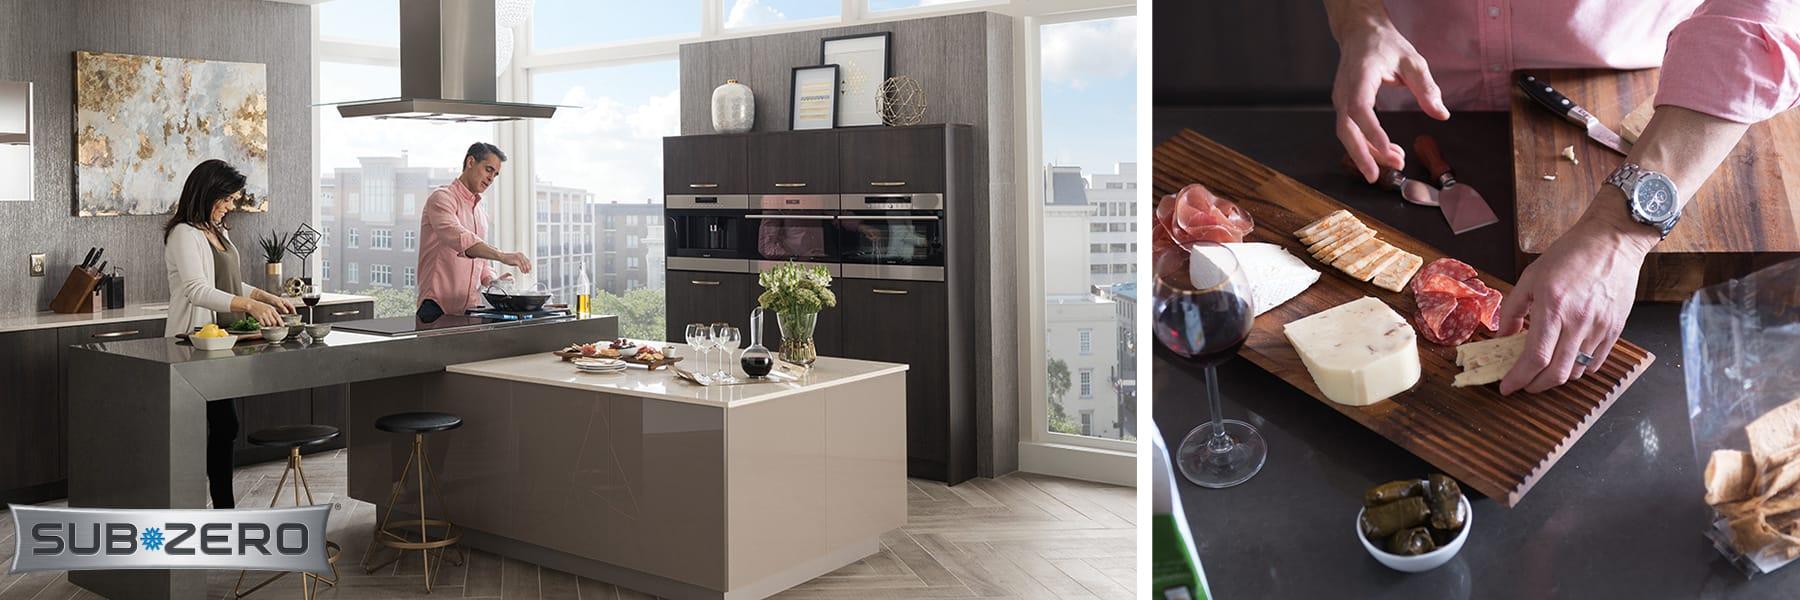 Aztec Appliance - Showcase Store - Home Appliances - Kitchen ...